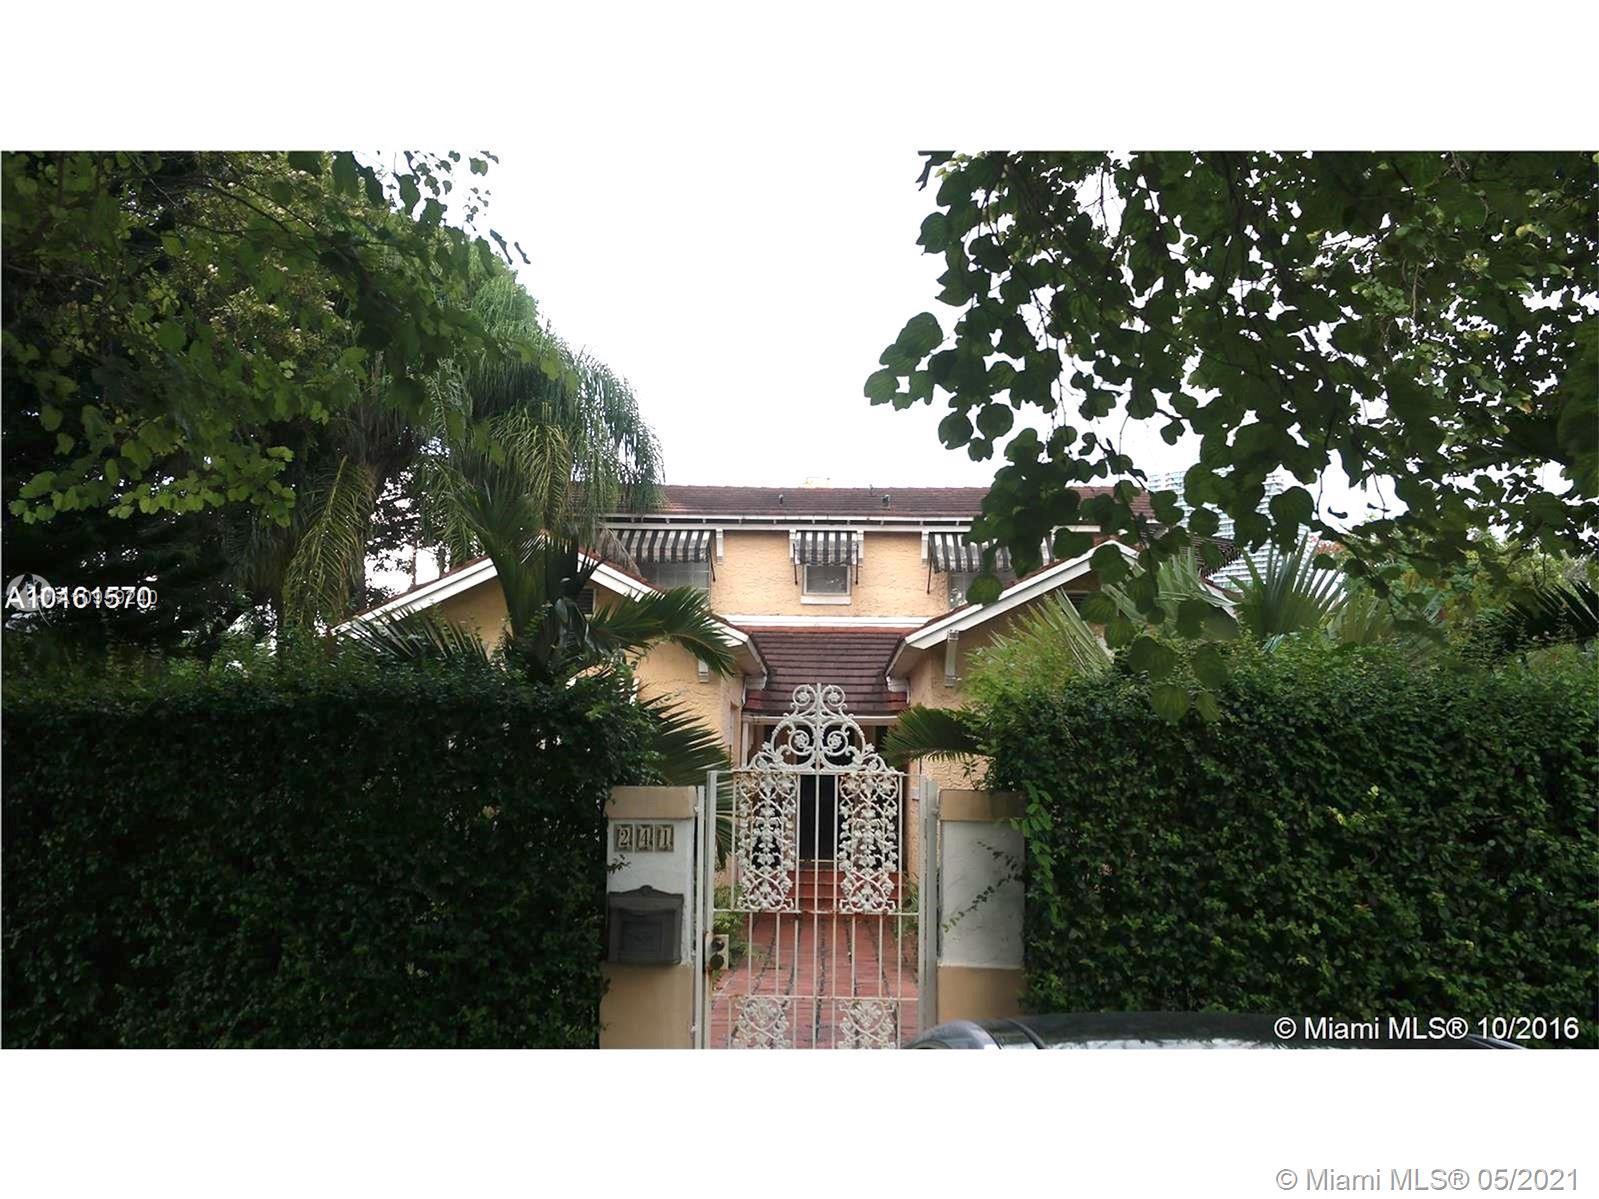 Holleman Park - 241 SW 19th Rd, Miami, FL 33129